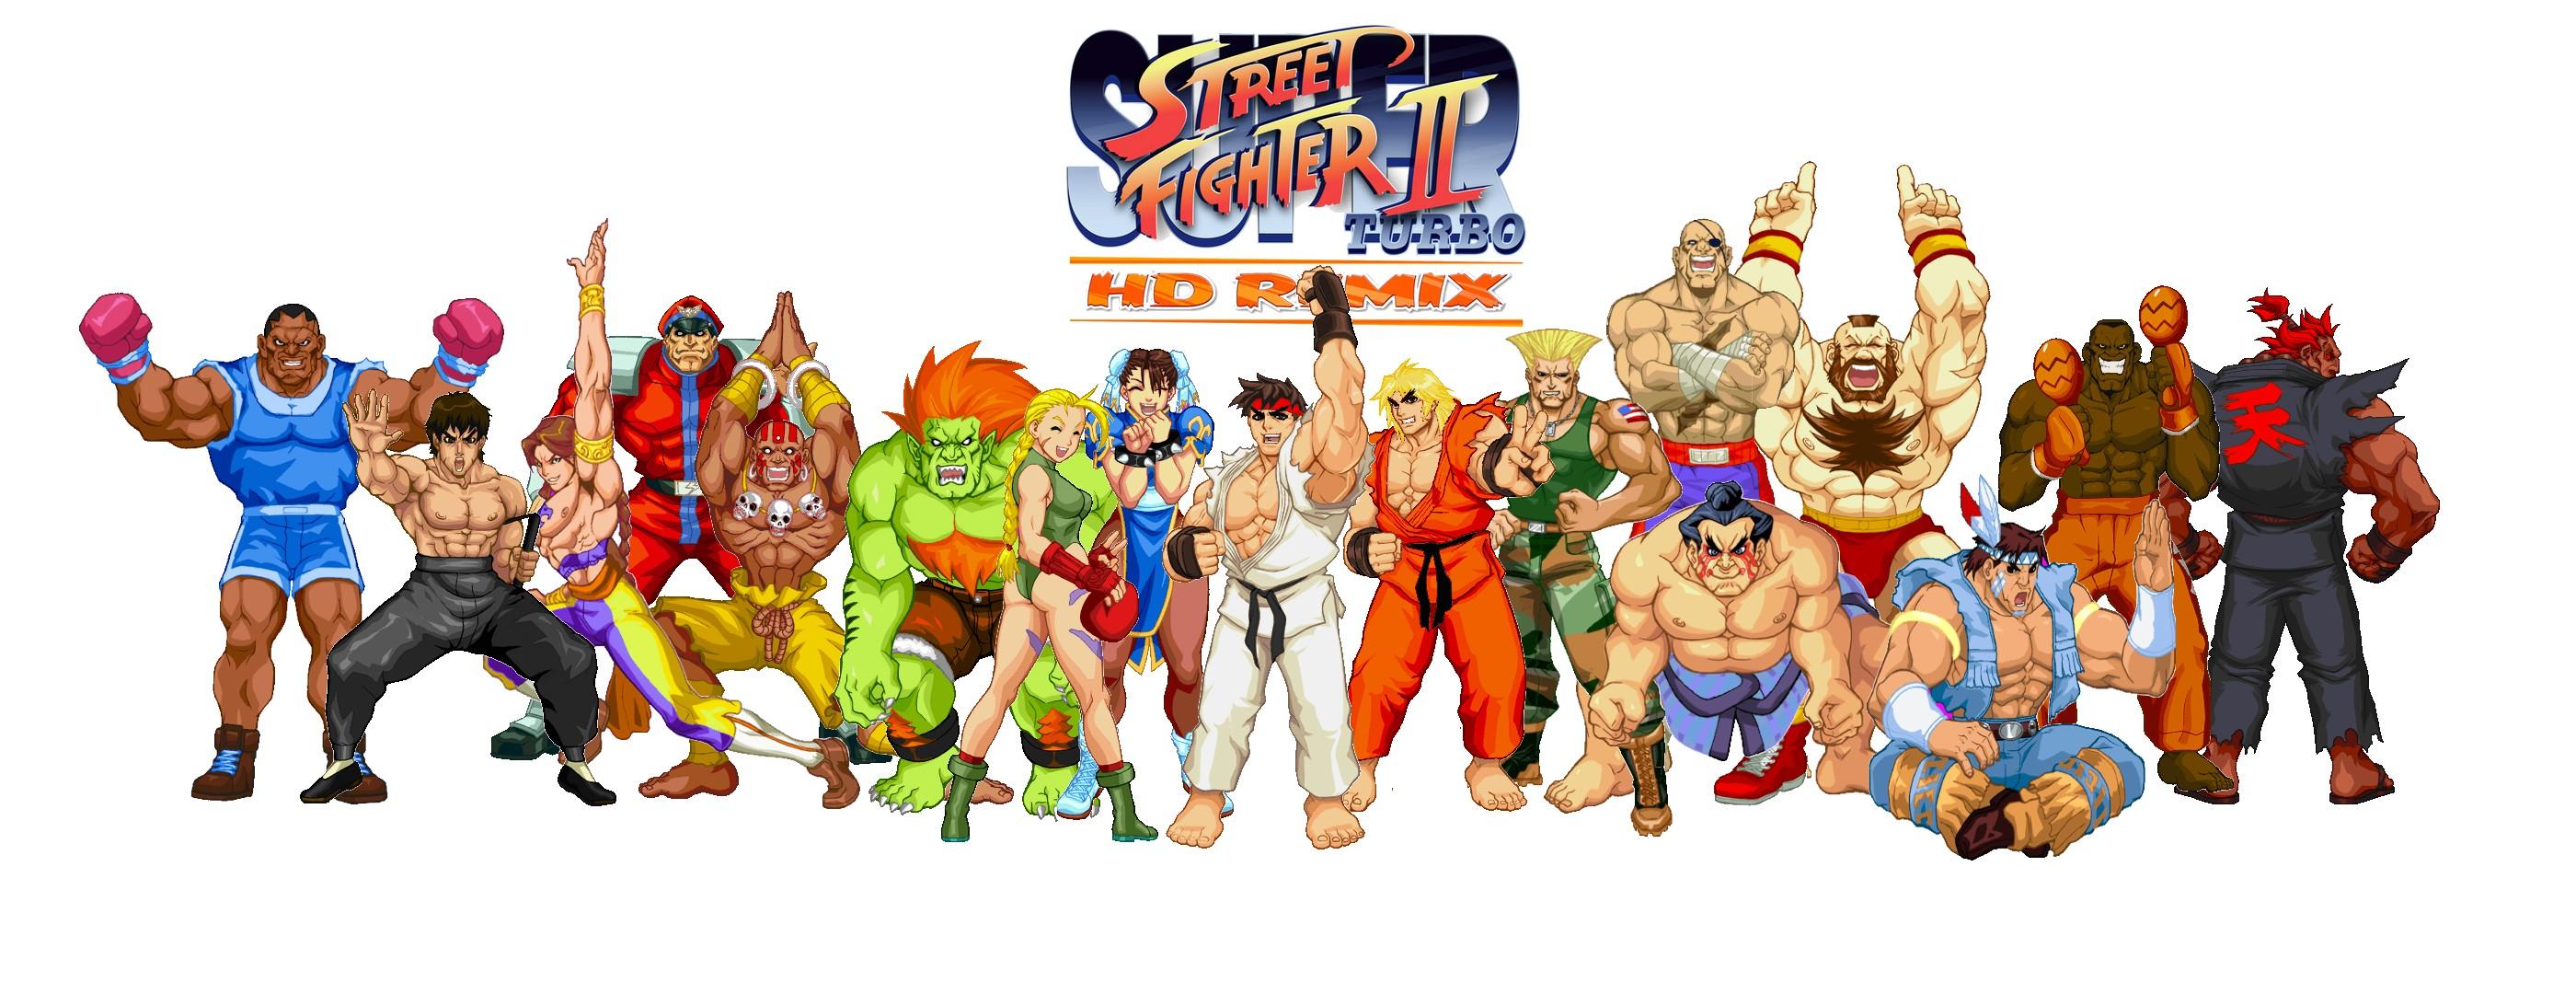 Super Street Fighter 2 turbo hd remix by juniorbunny